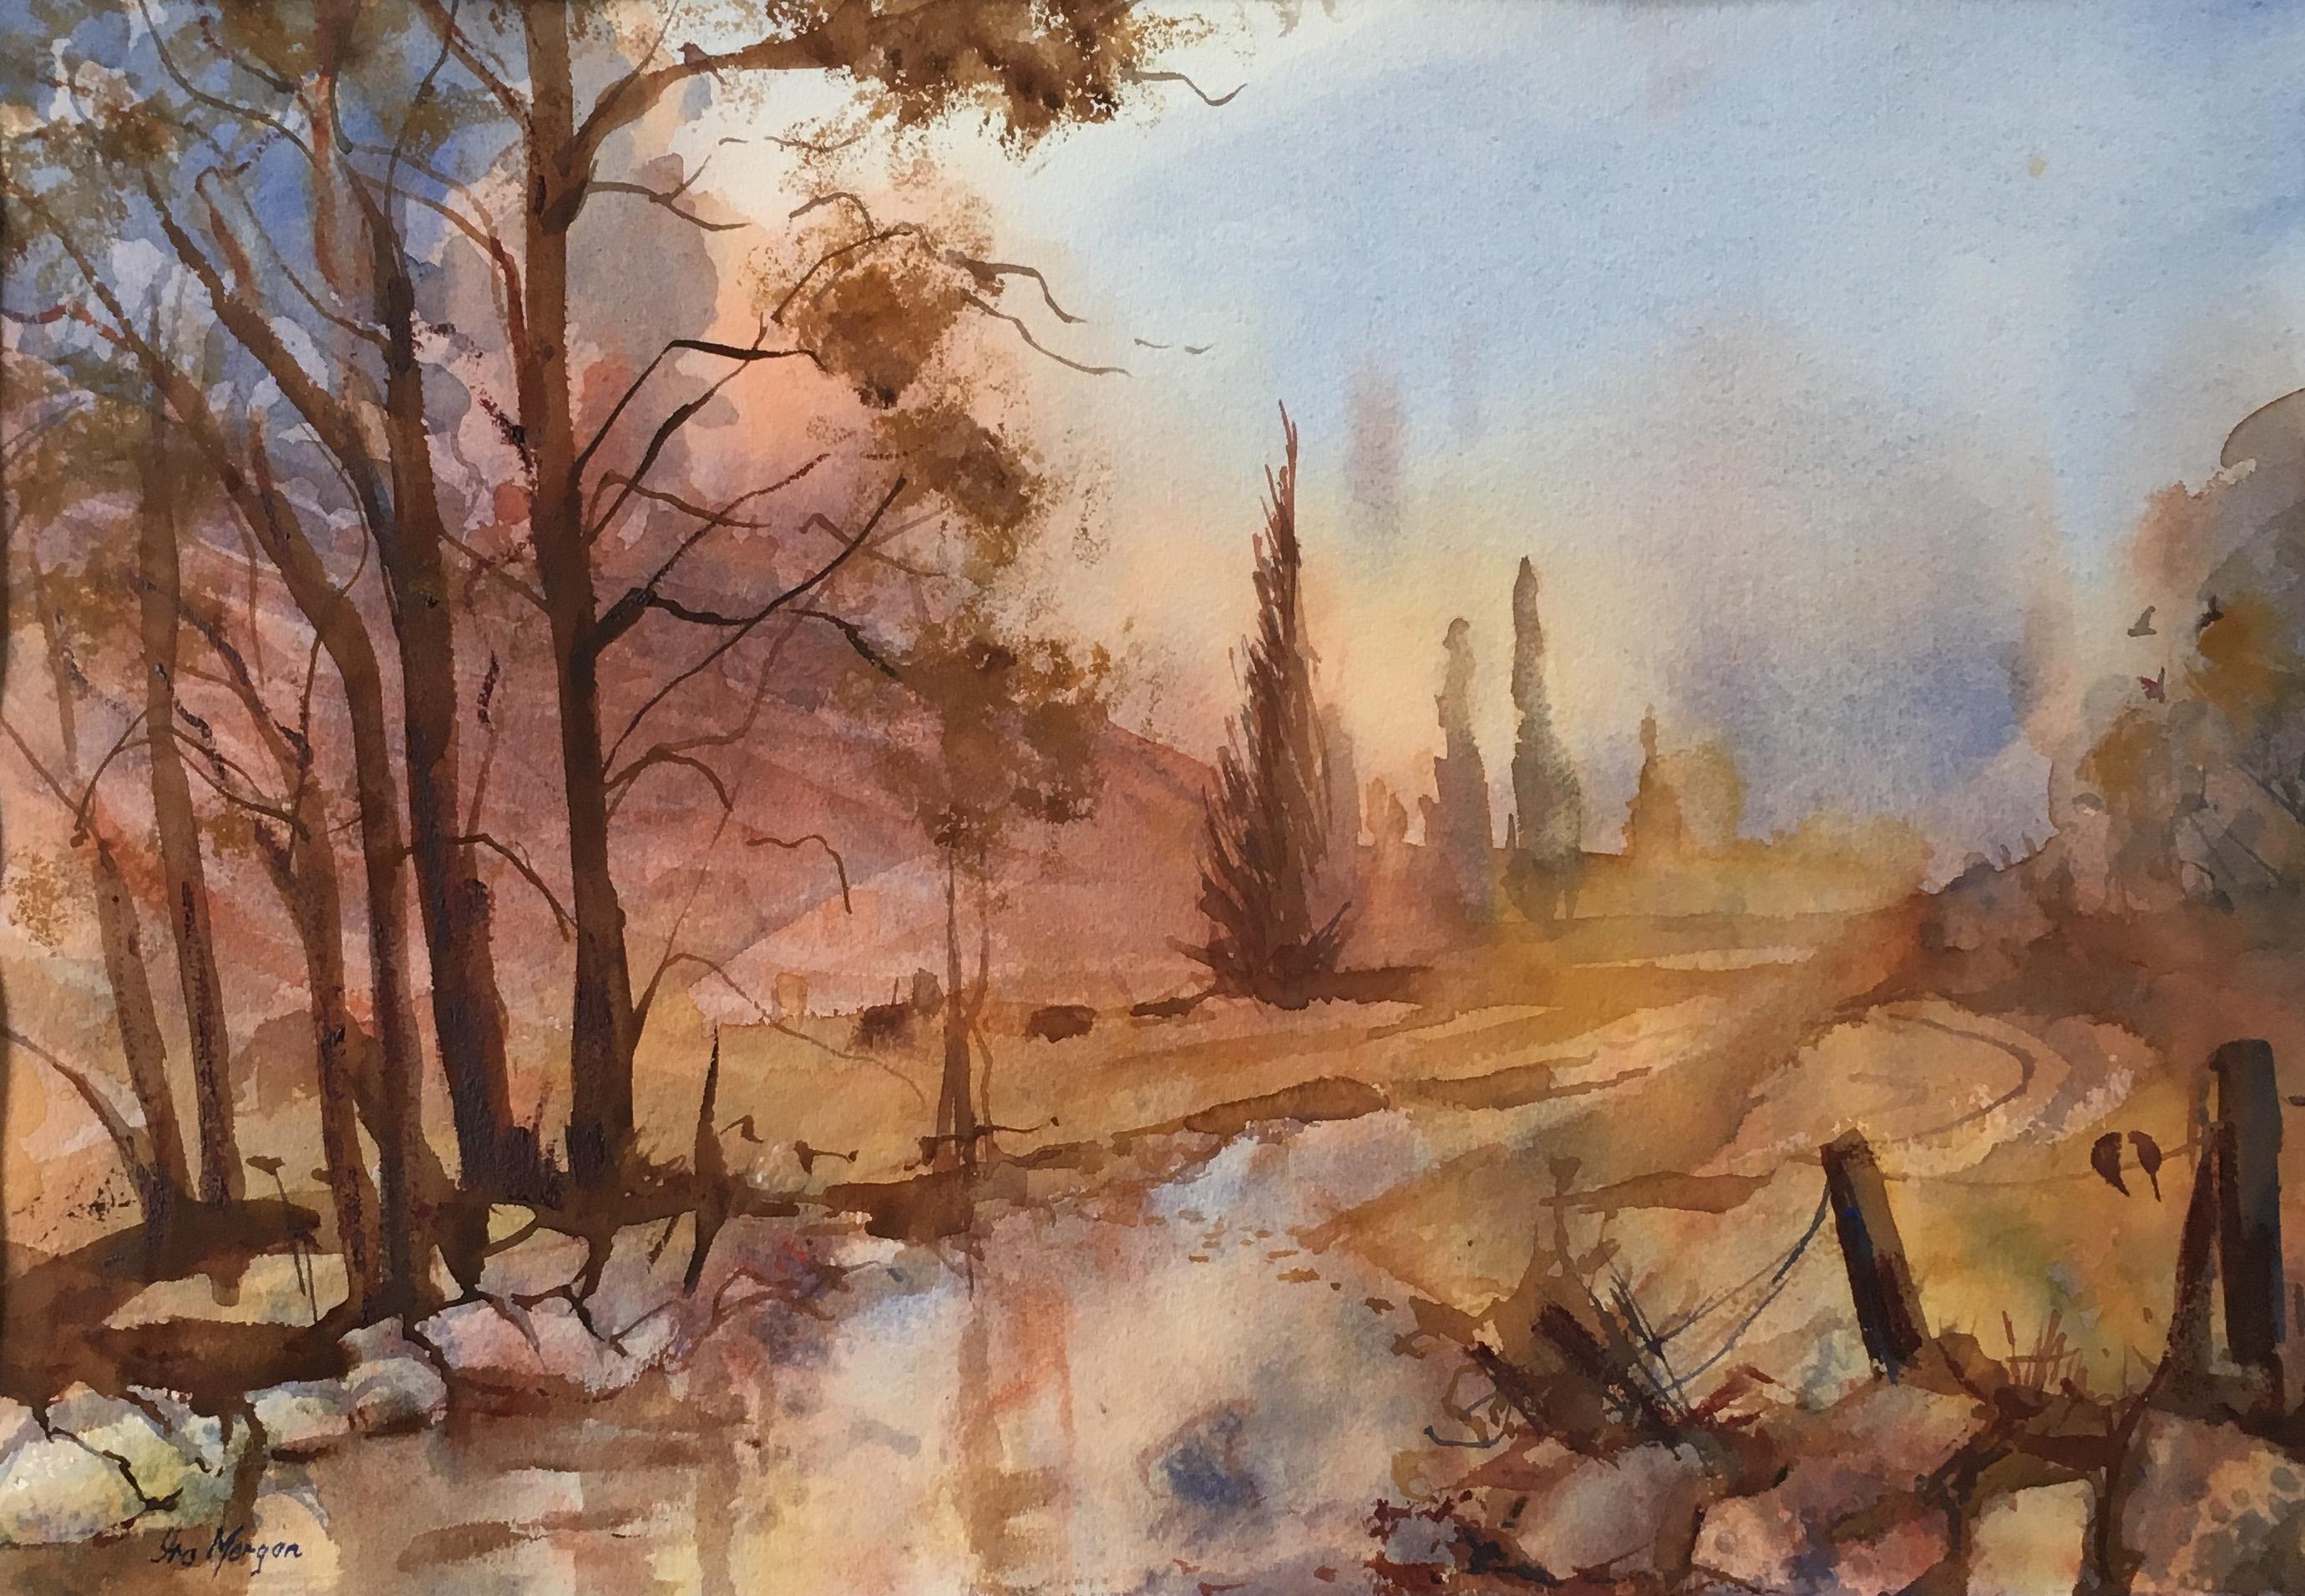 511. ' Umber trees'